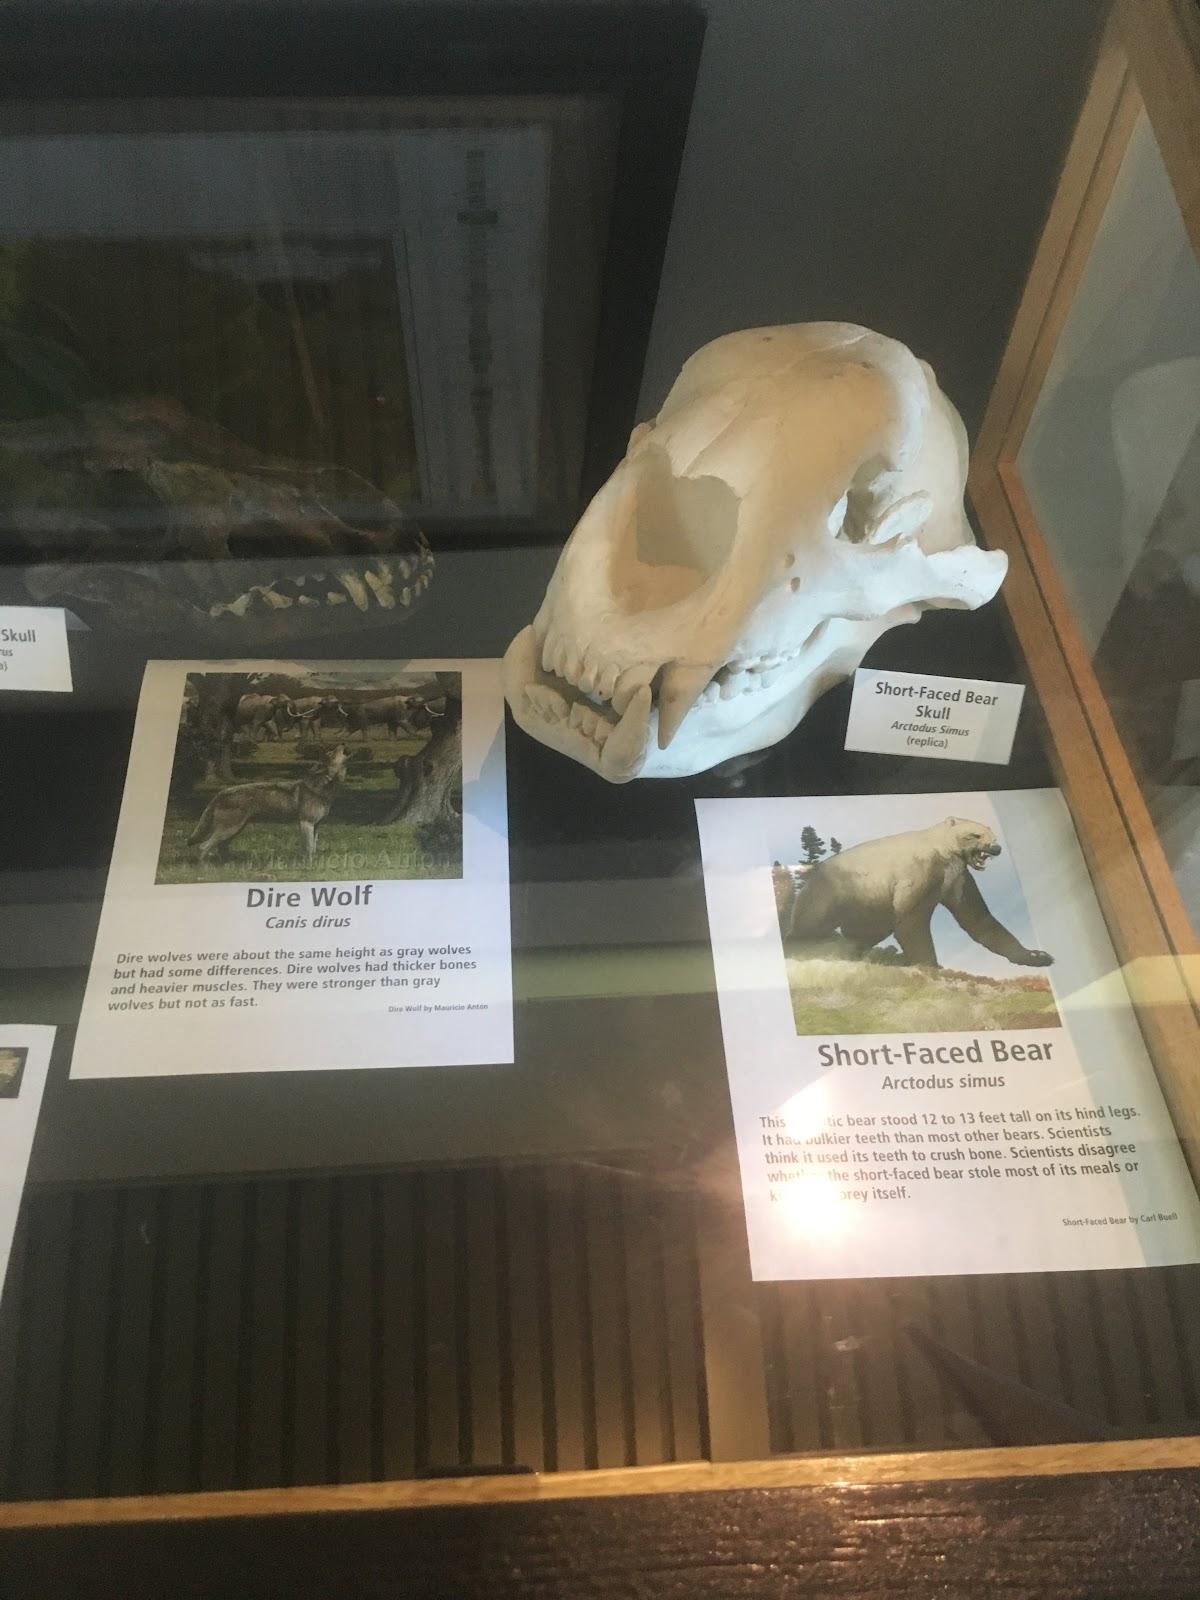 Waco Mammoth Cave History - The Happy Mustard Seed